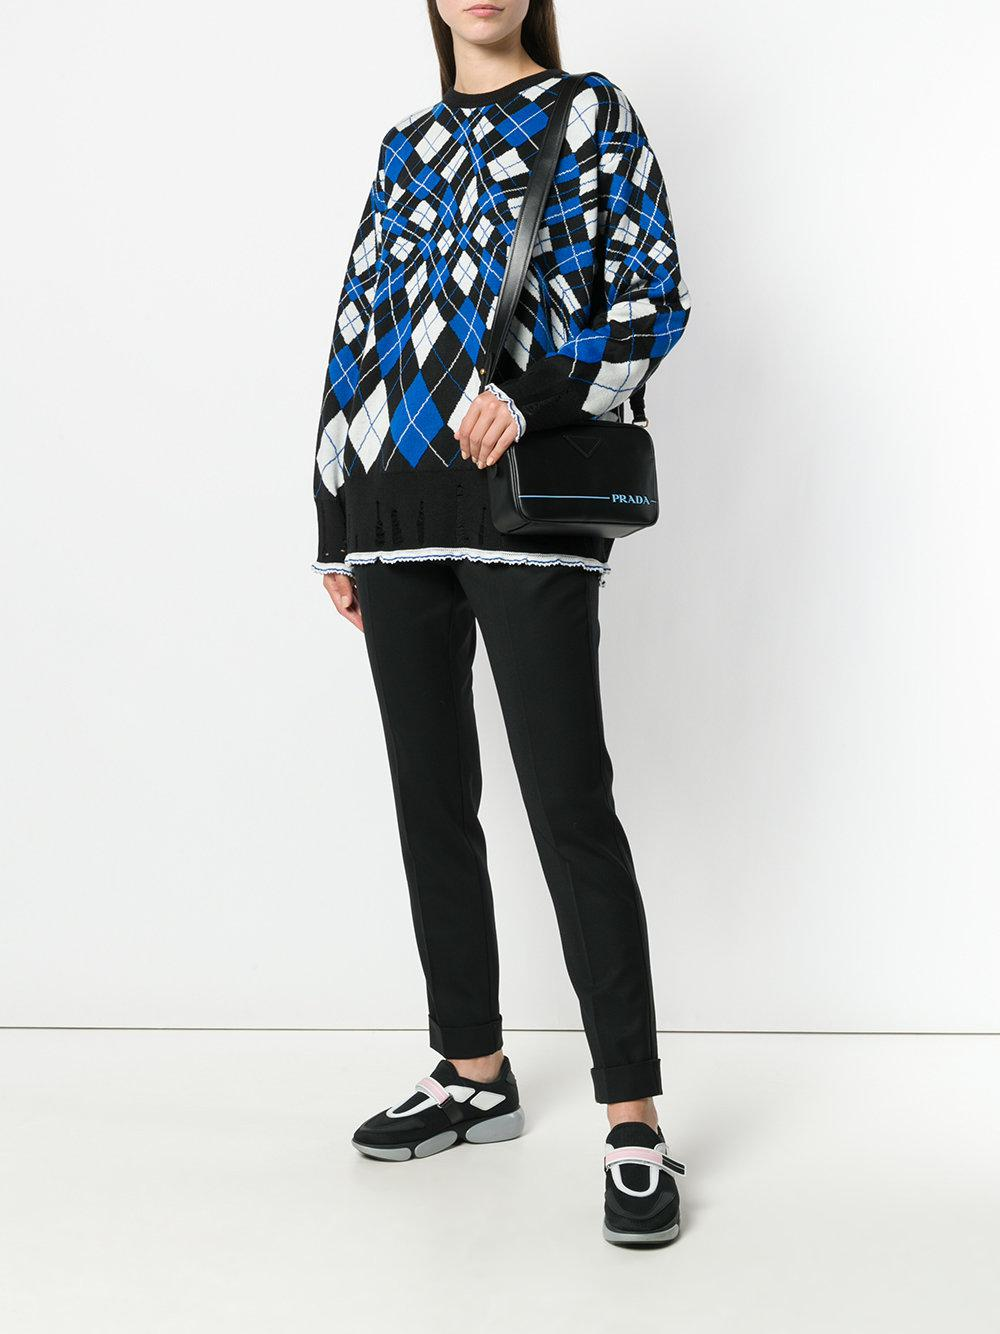 0f868130dbe7b8 Prada Mirage Leather Shoulder Bag in Black - Lyst